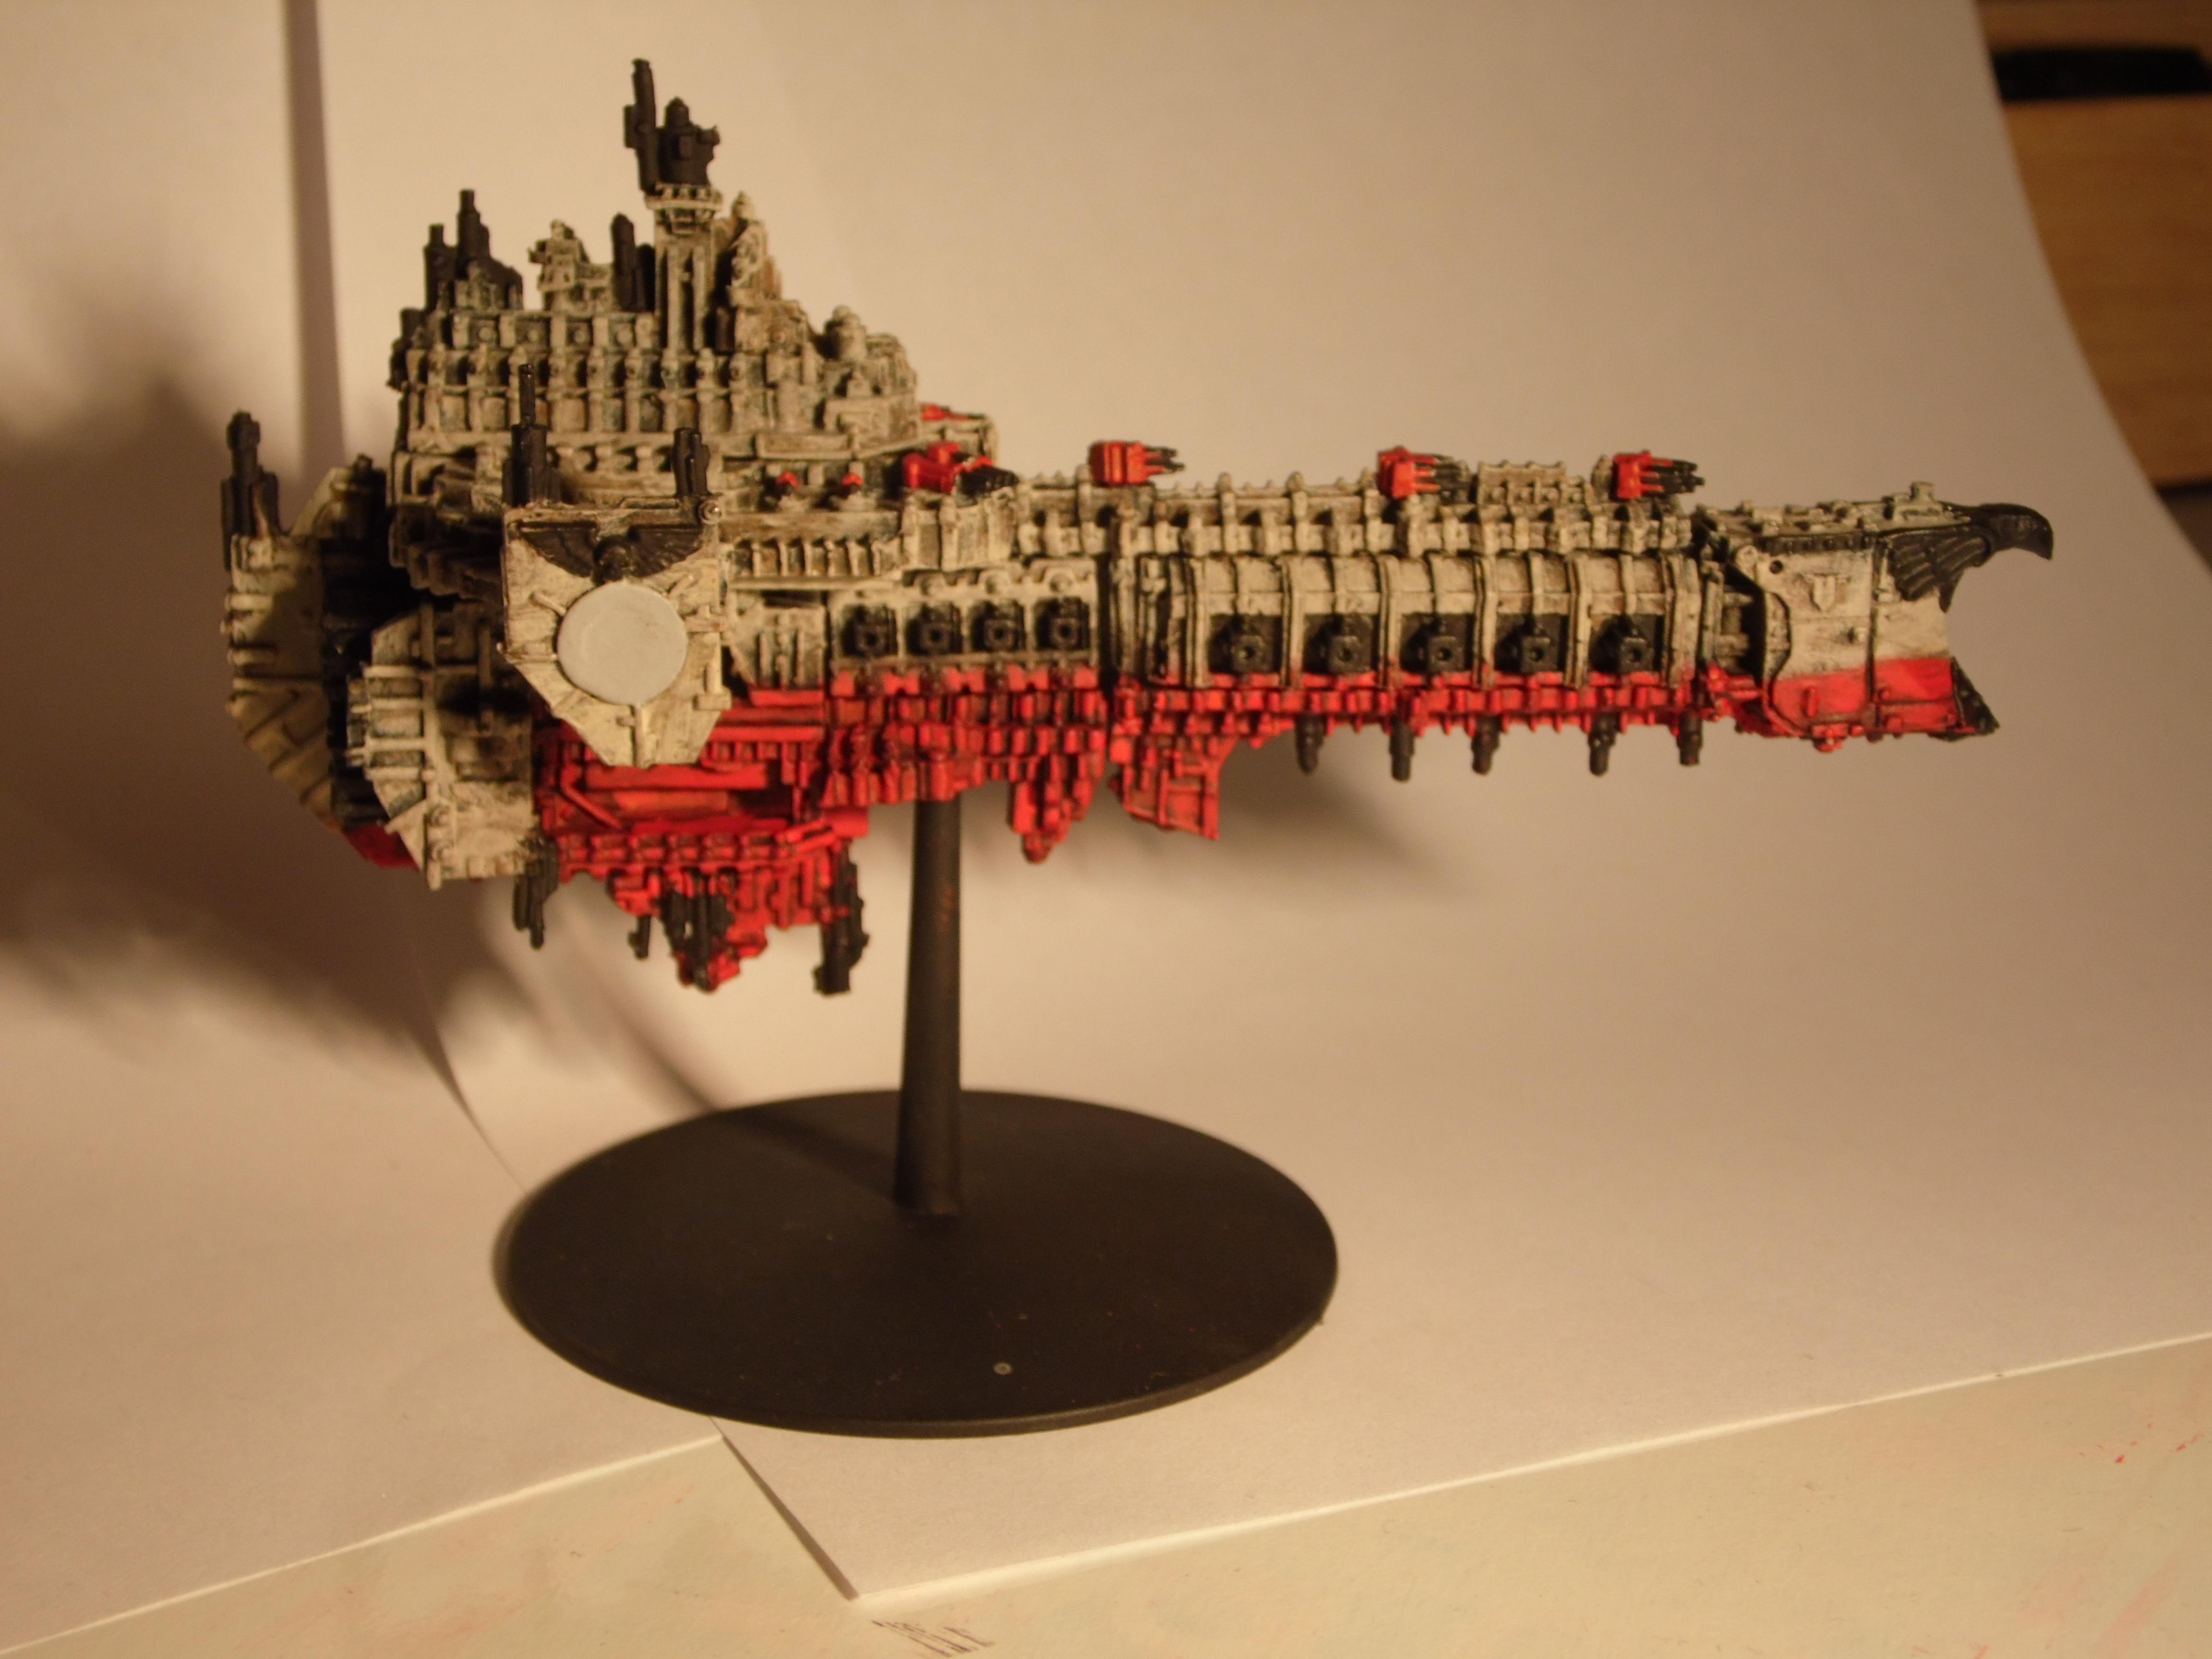 Battlefleet Gothic, Battleship, Retribution